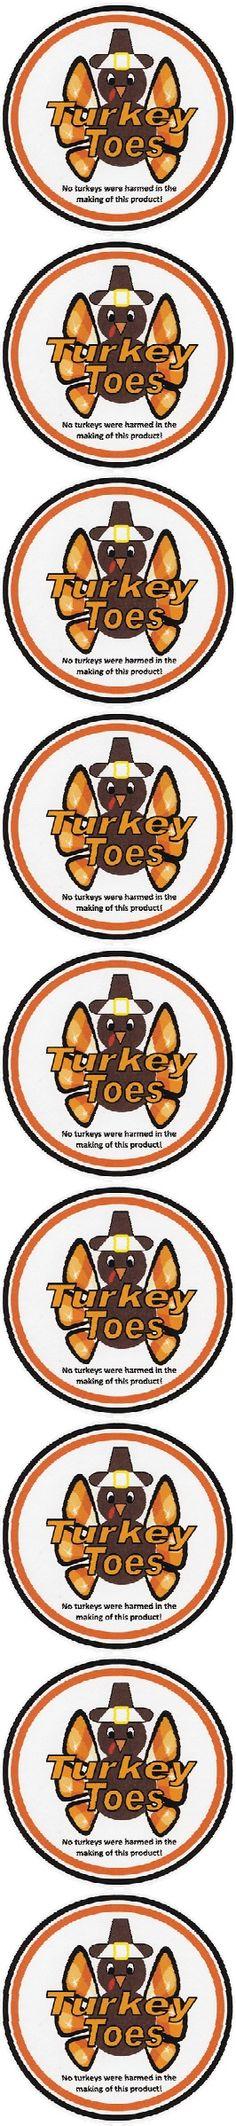 3 inch Turkey Toes